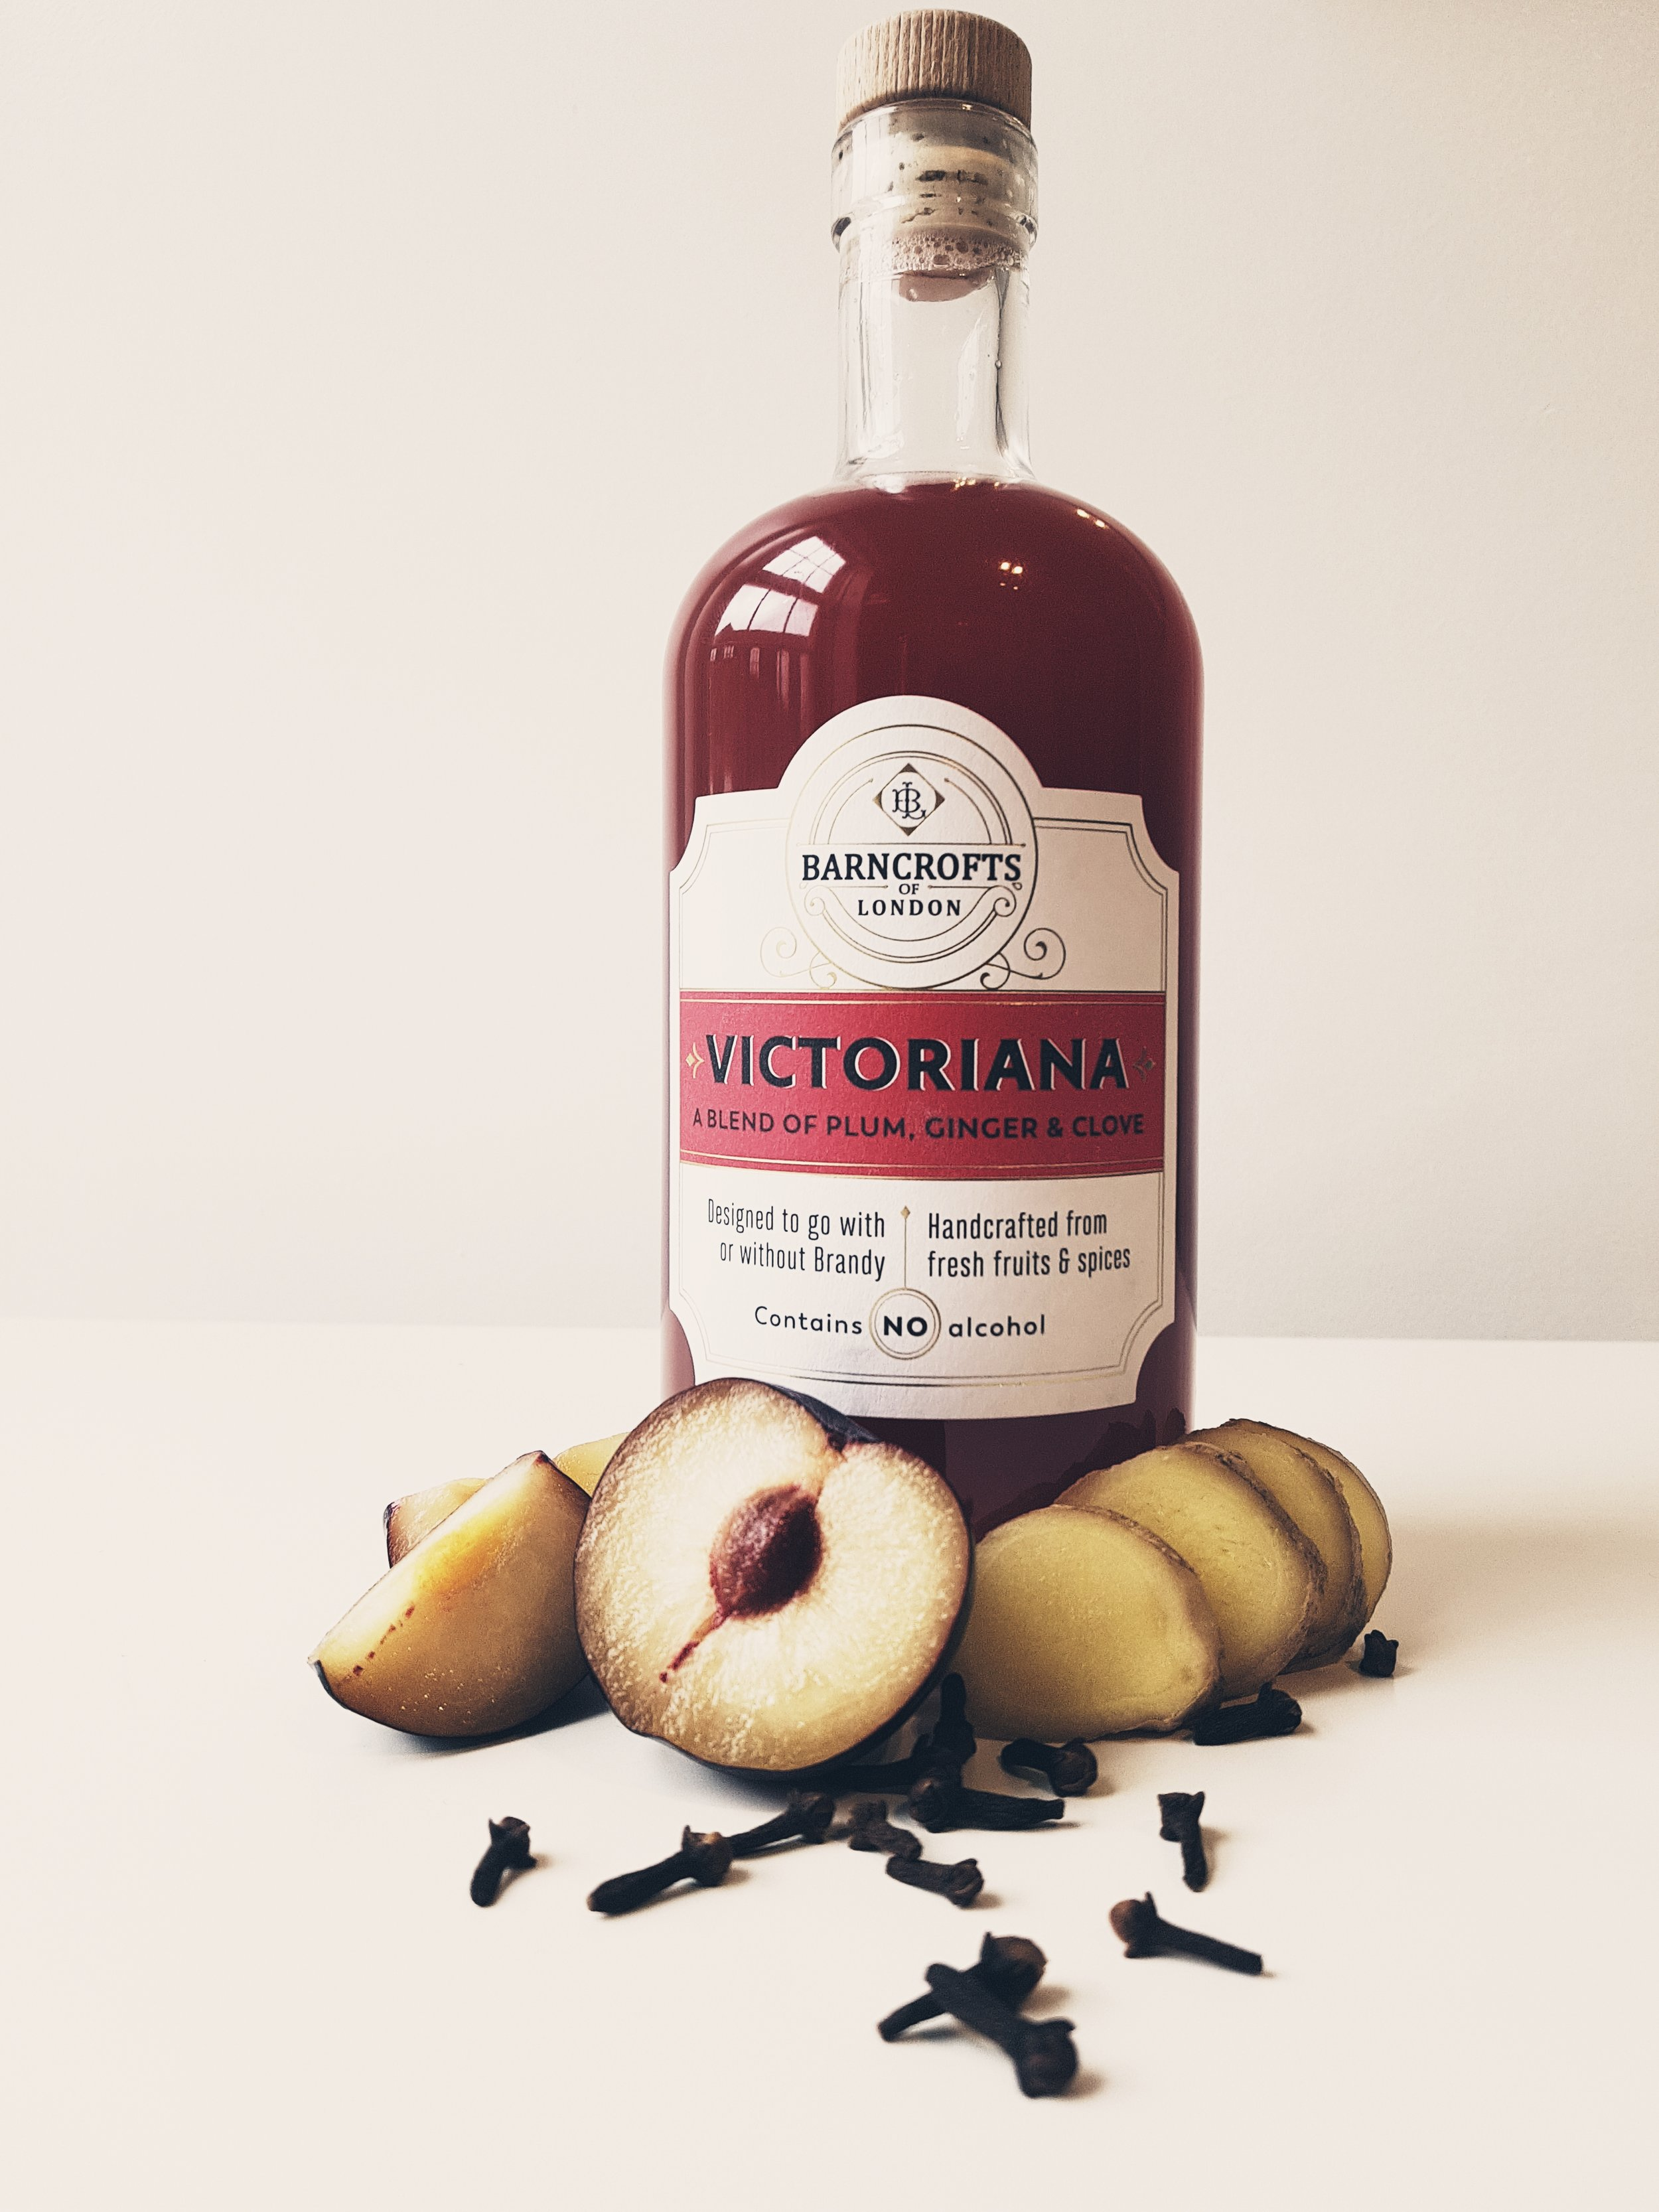 say hello to the - The beautiful Victoriana